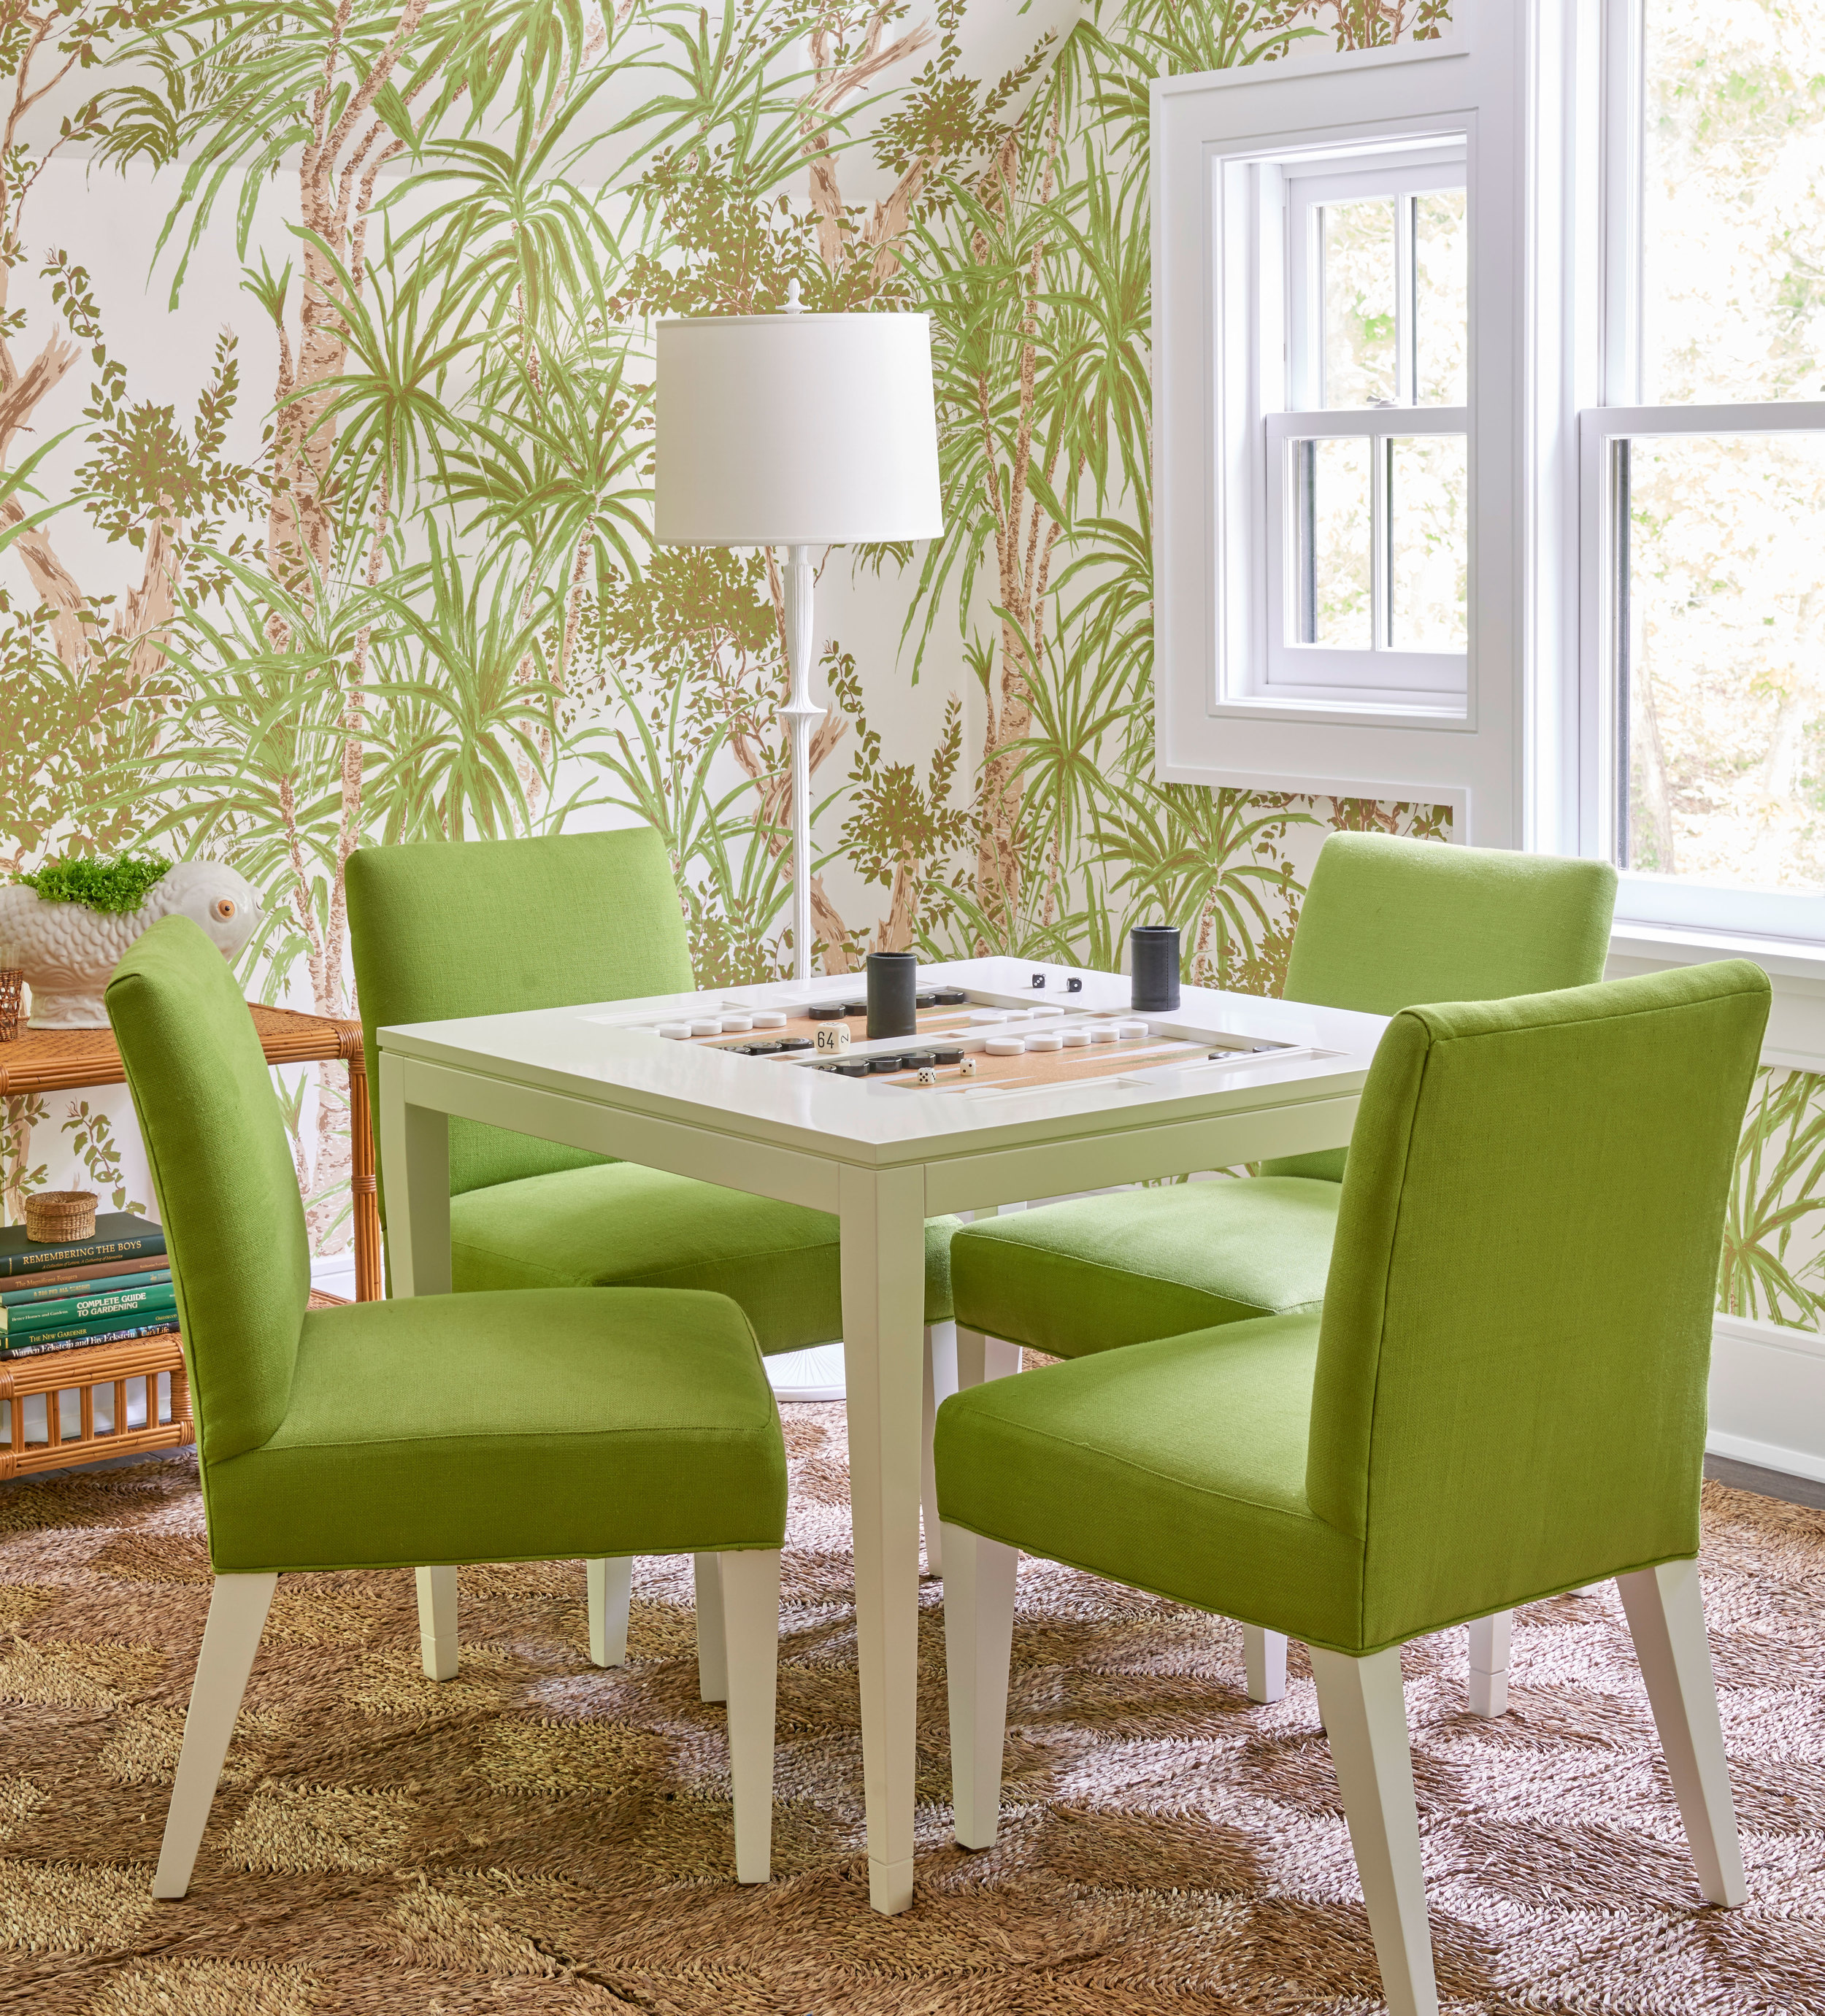 Meg-Braff---Coastal-Living-Coastal-Idea-House-Game-Table-Wallpaper.jpg